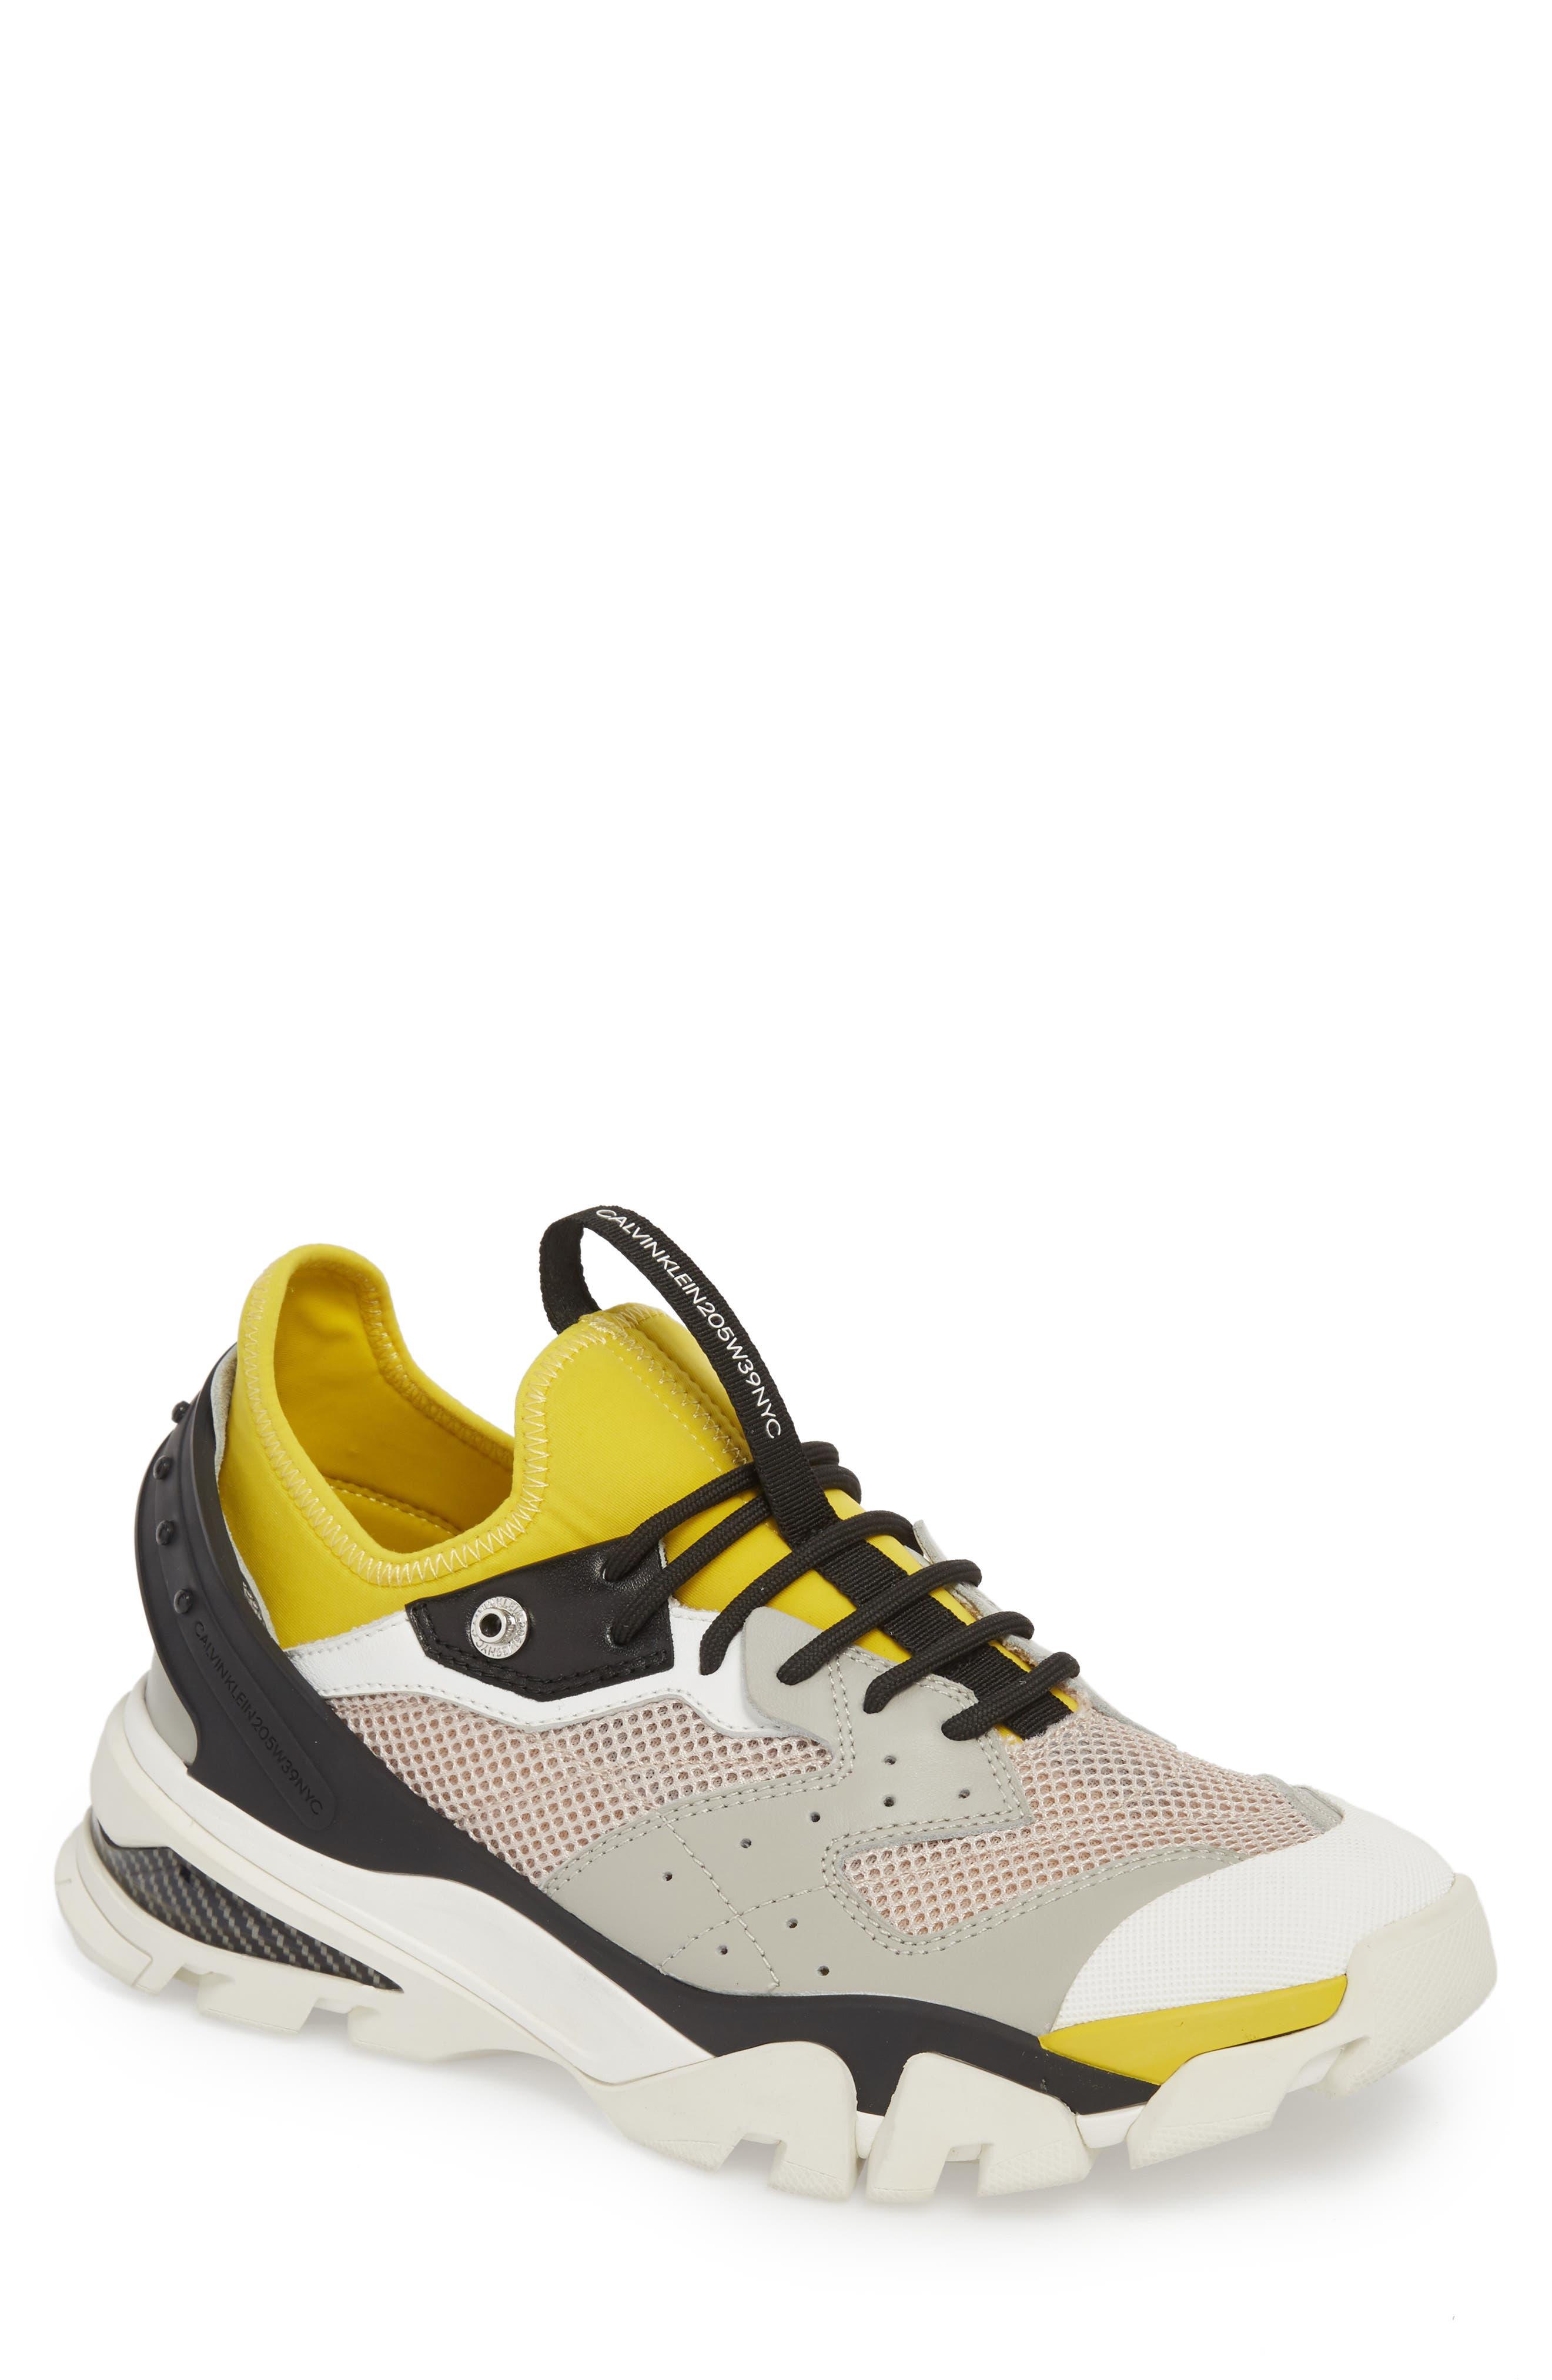 Carlos 10 Snapback Runner Sneaker,                         Main,                         color, GREY/ YELLOW/ BLACK/ WHITE